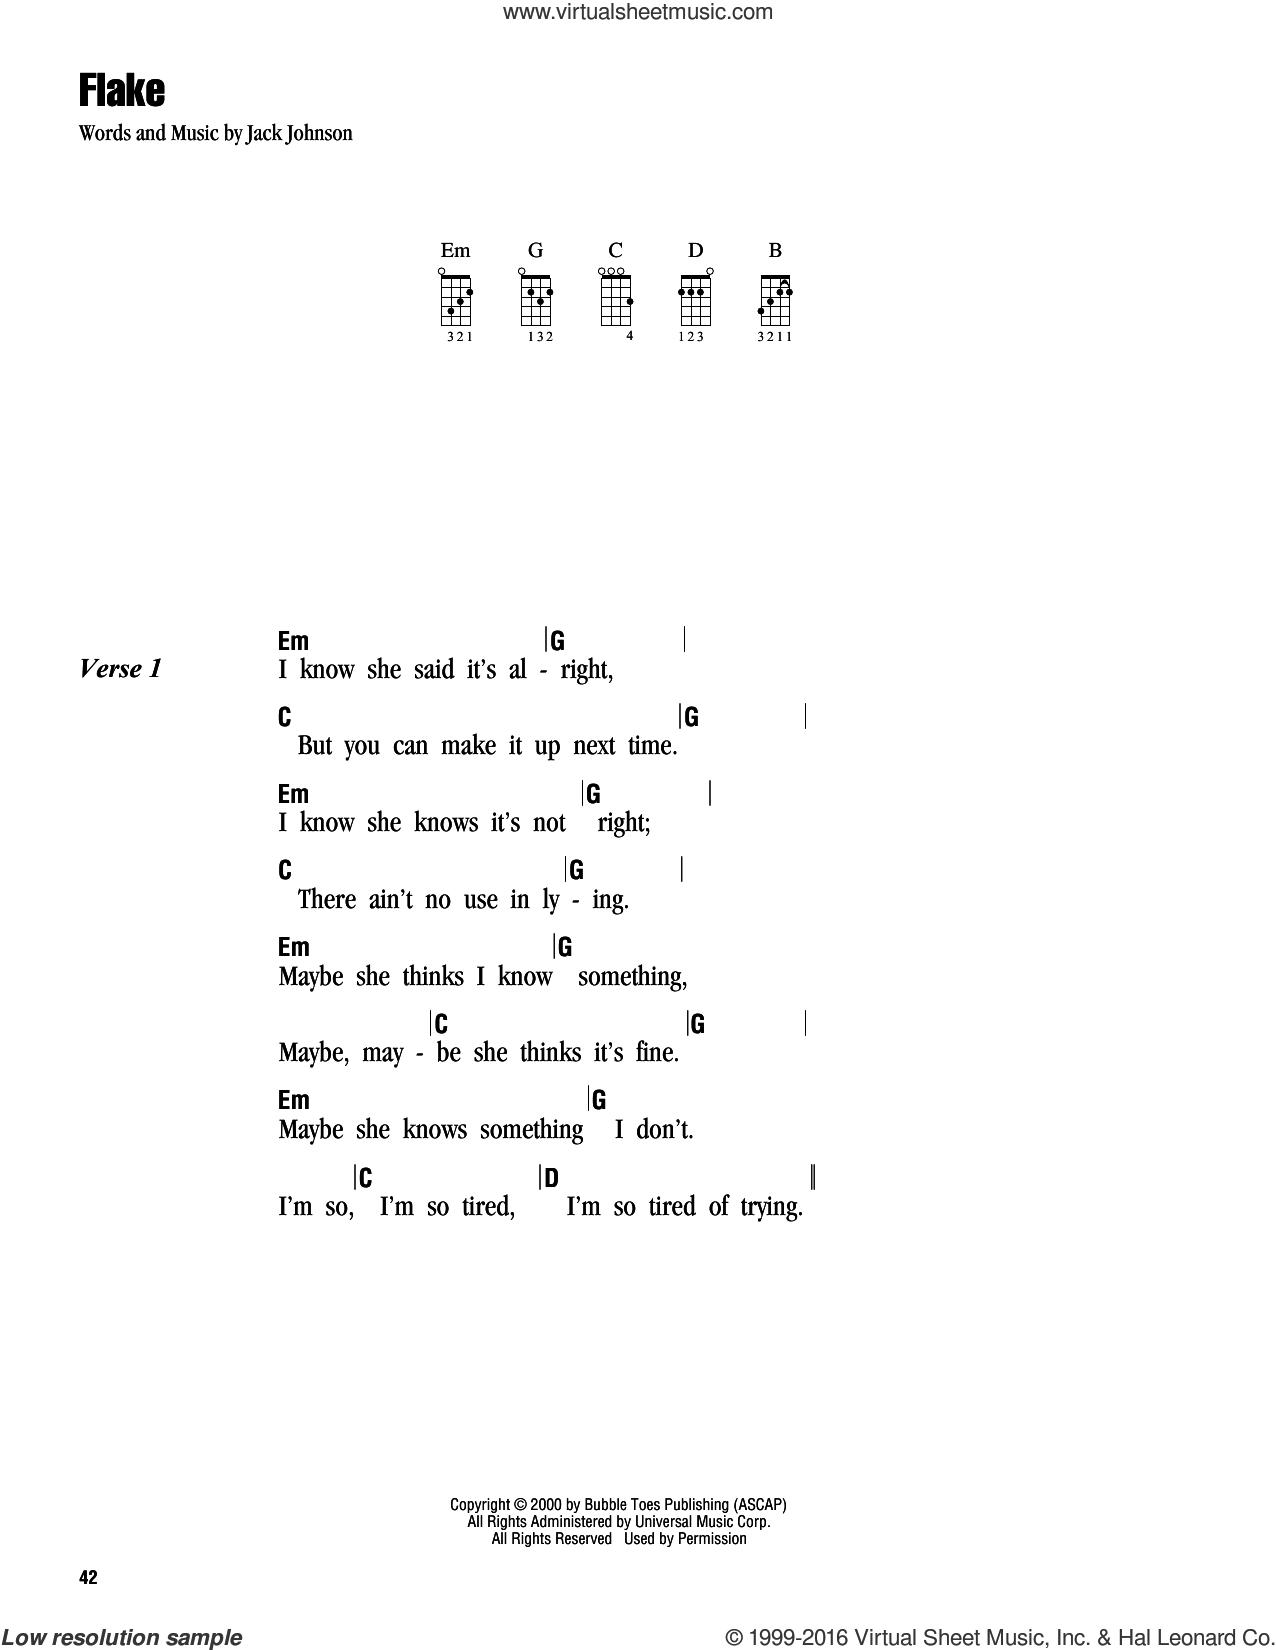 Johnson flake sheet music for ukulele chords flake sheet music for ukulele chords by jack johnson intermediate score image hexwebz Choice Image